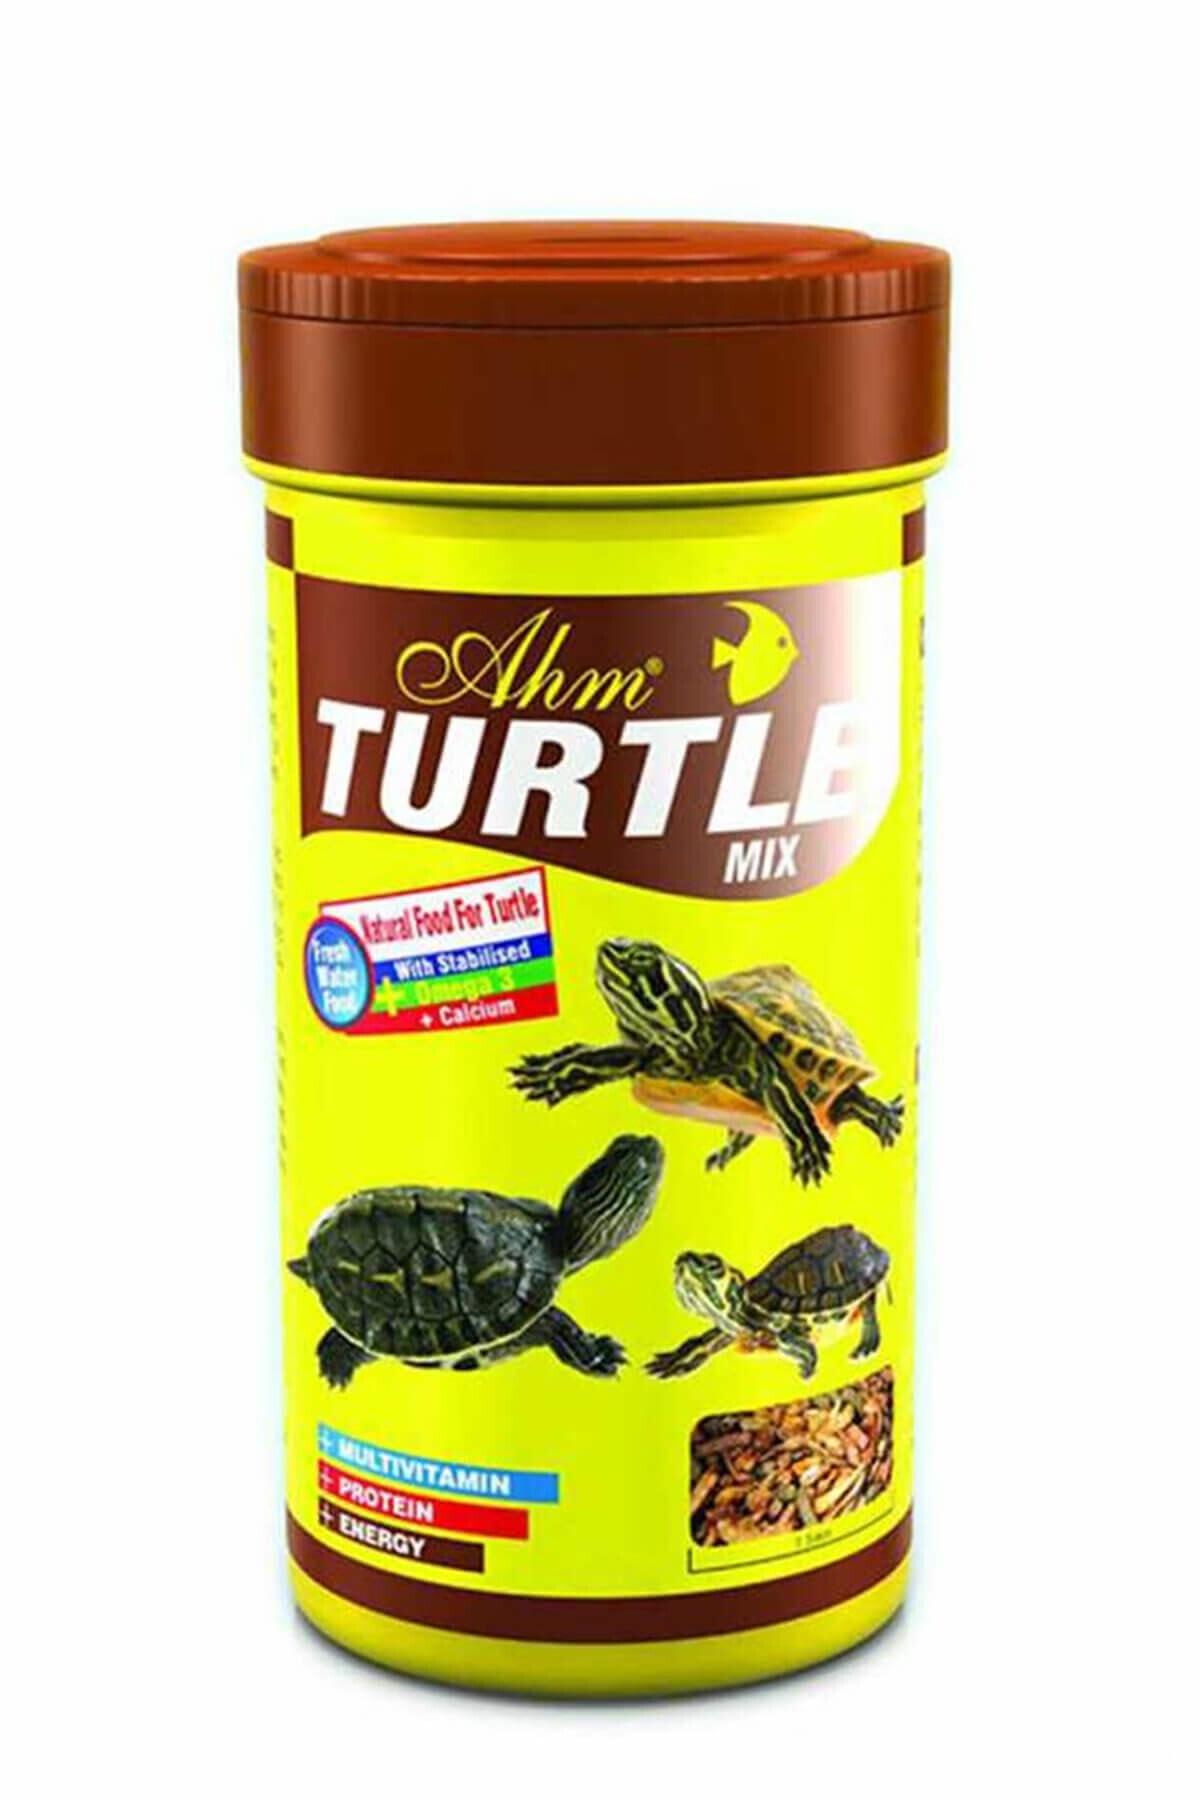 Ahm Turtle Mix 1000 Ml. 8699375334692 1